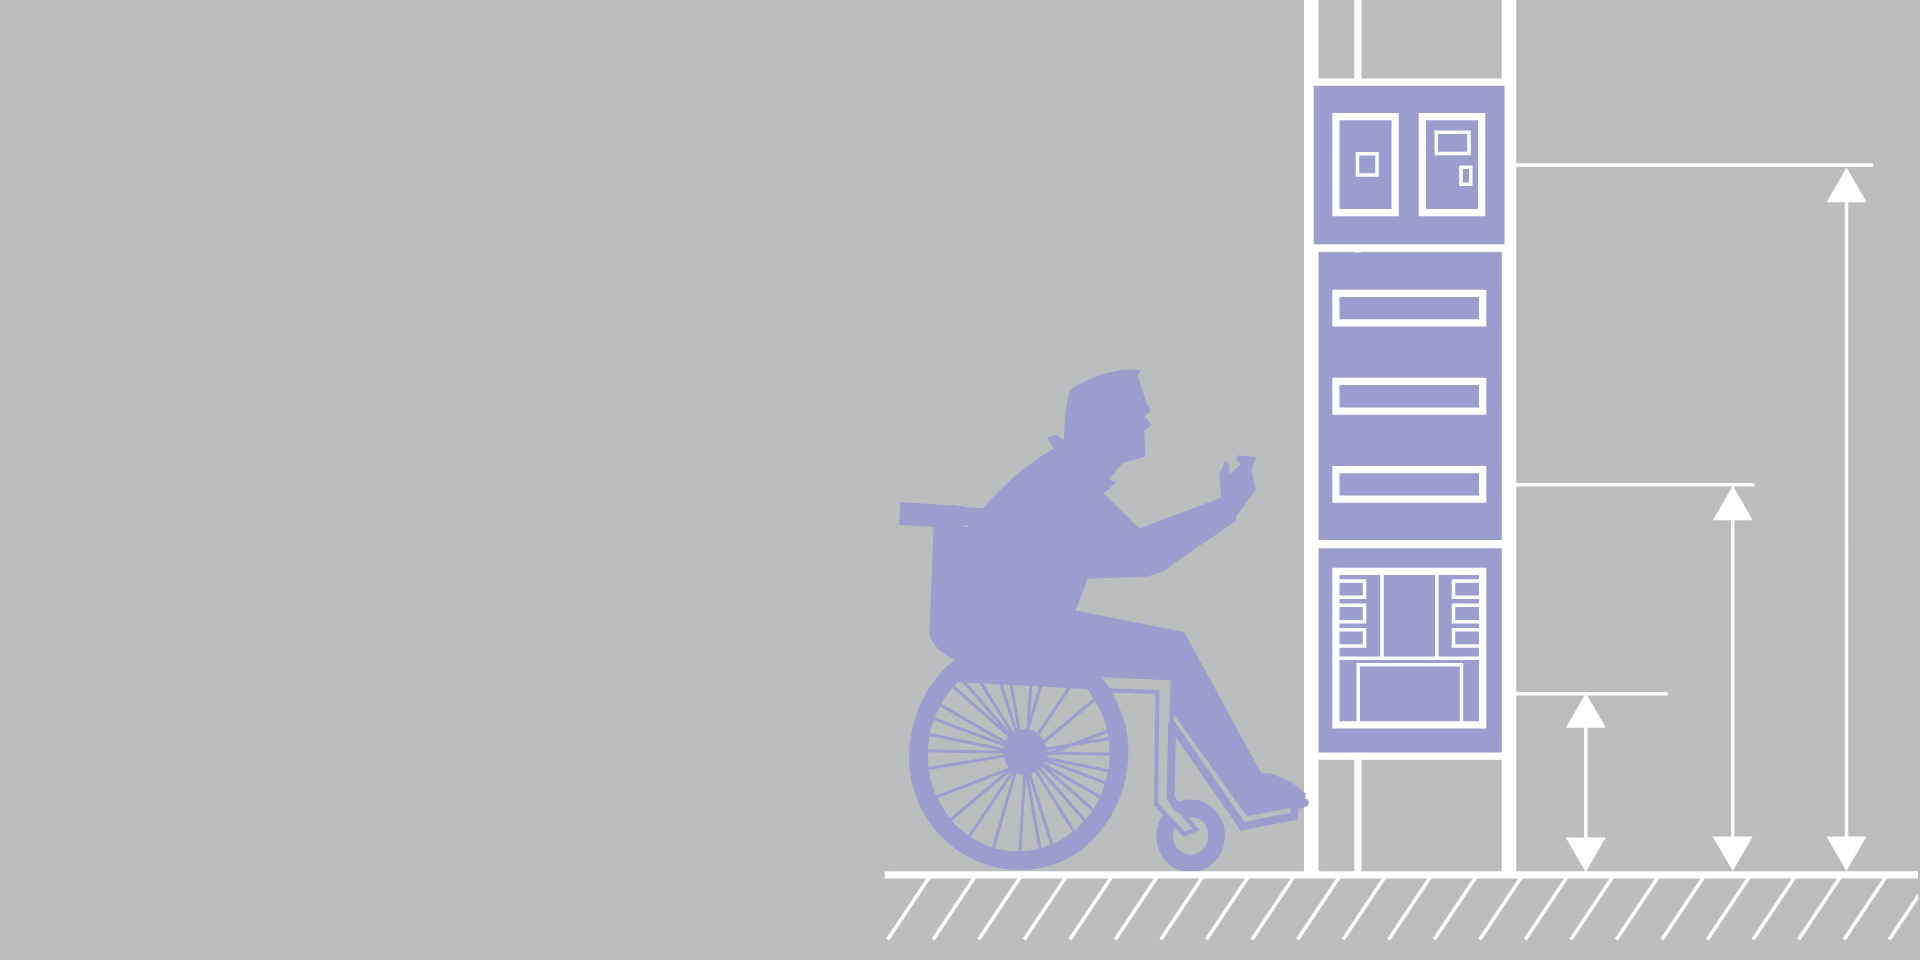 normes accessibilit handicap s maison individuelle 2017 ventana blog. Black Bedroom Furniture Sets. Home Design Ideas